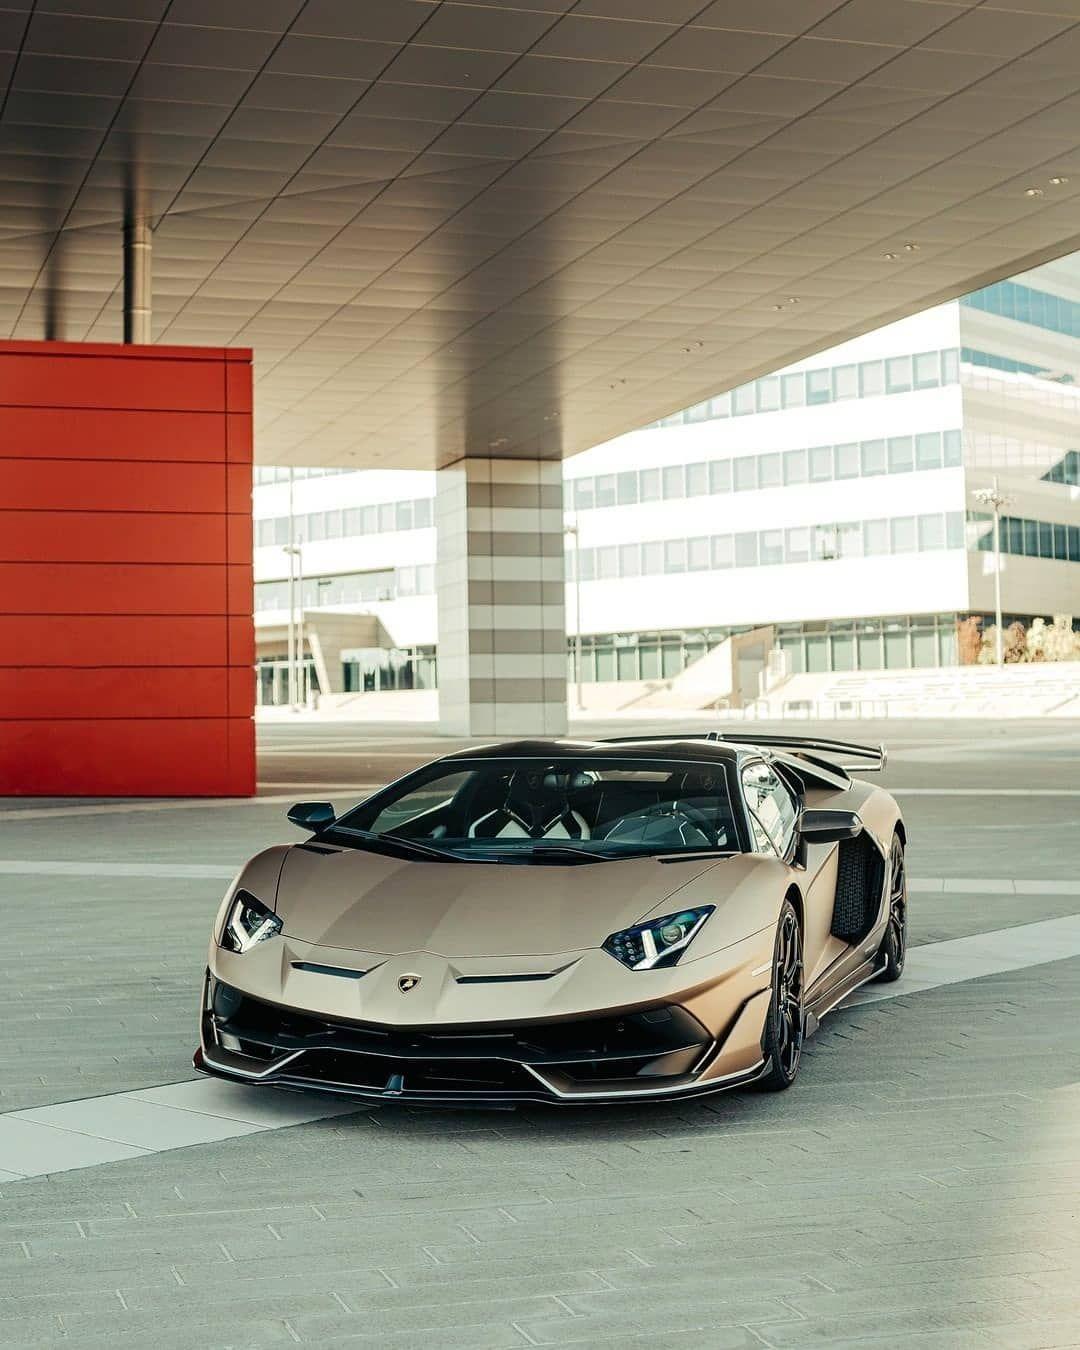 Reposted From Lamborghini Italian Genius Technological Greatness Universal Beauty The Aventador Svj Ro Sports Cars Lamborghini Best Luxury Cars Lamborghini